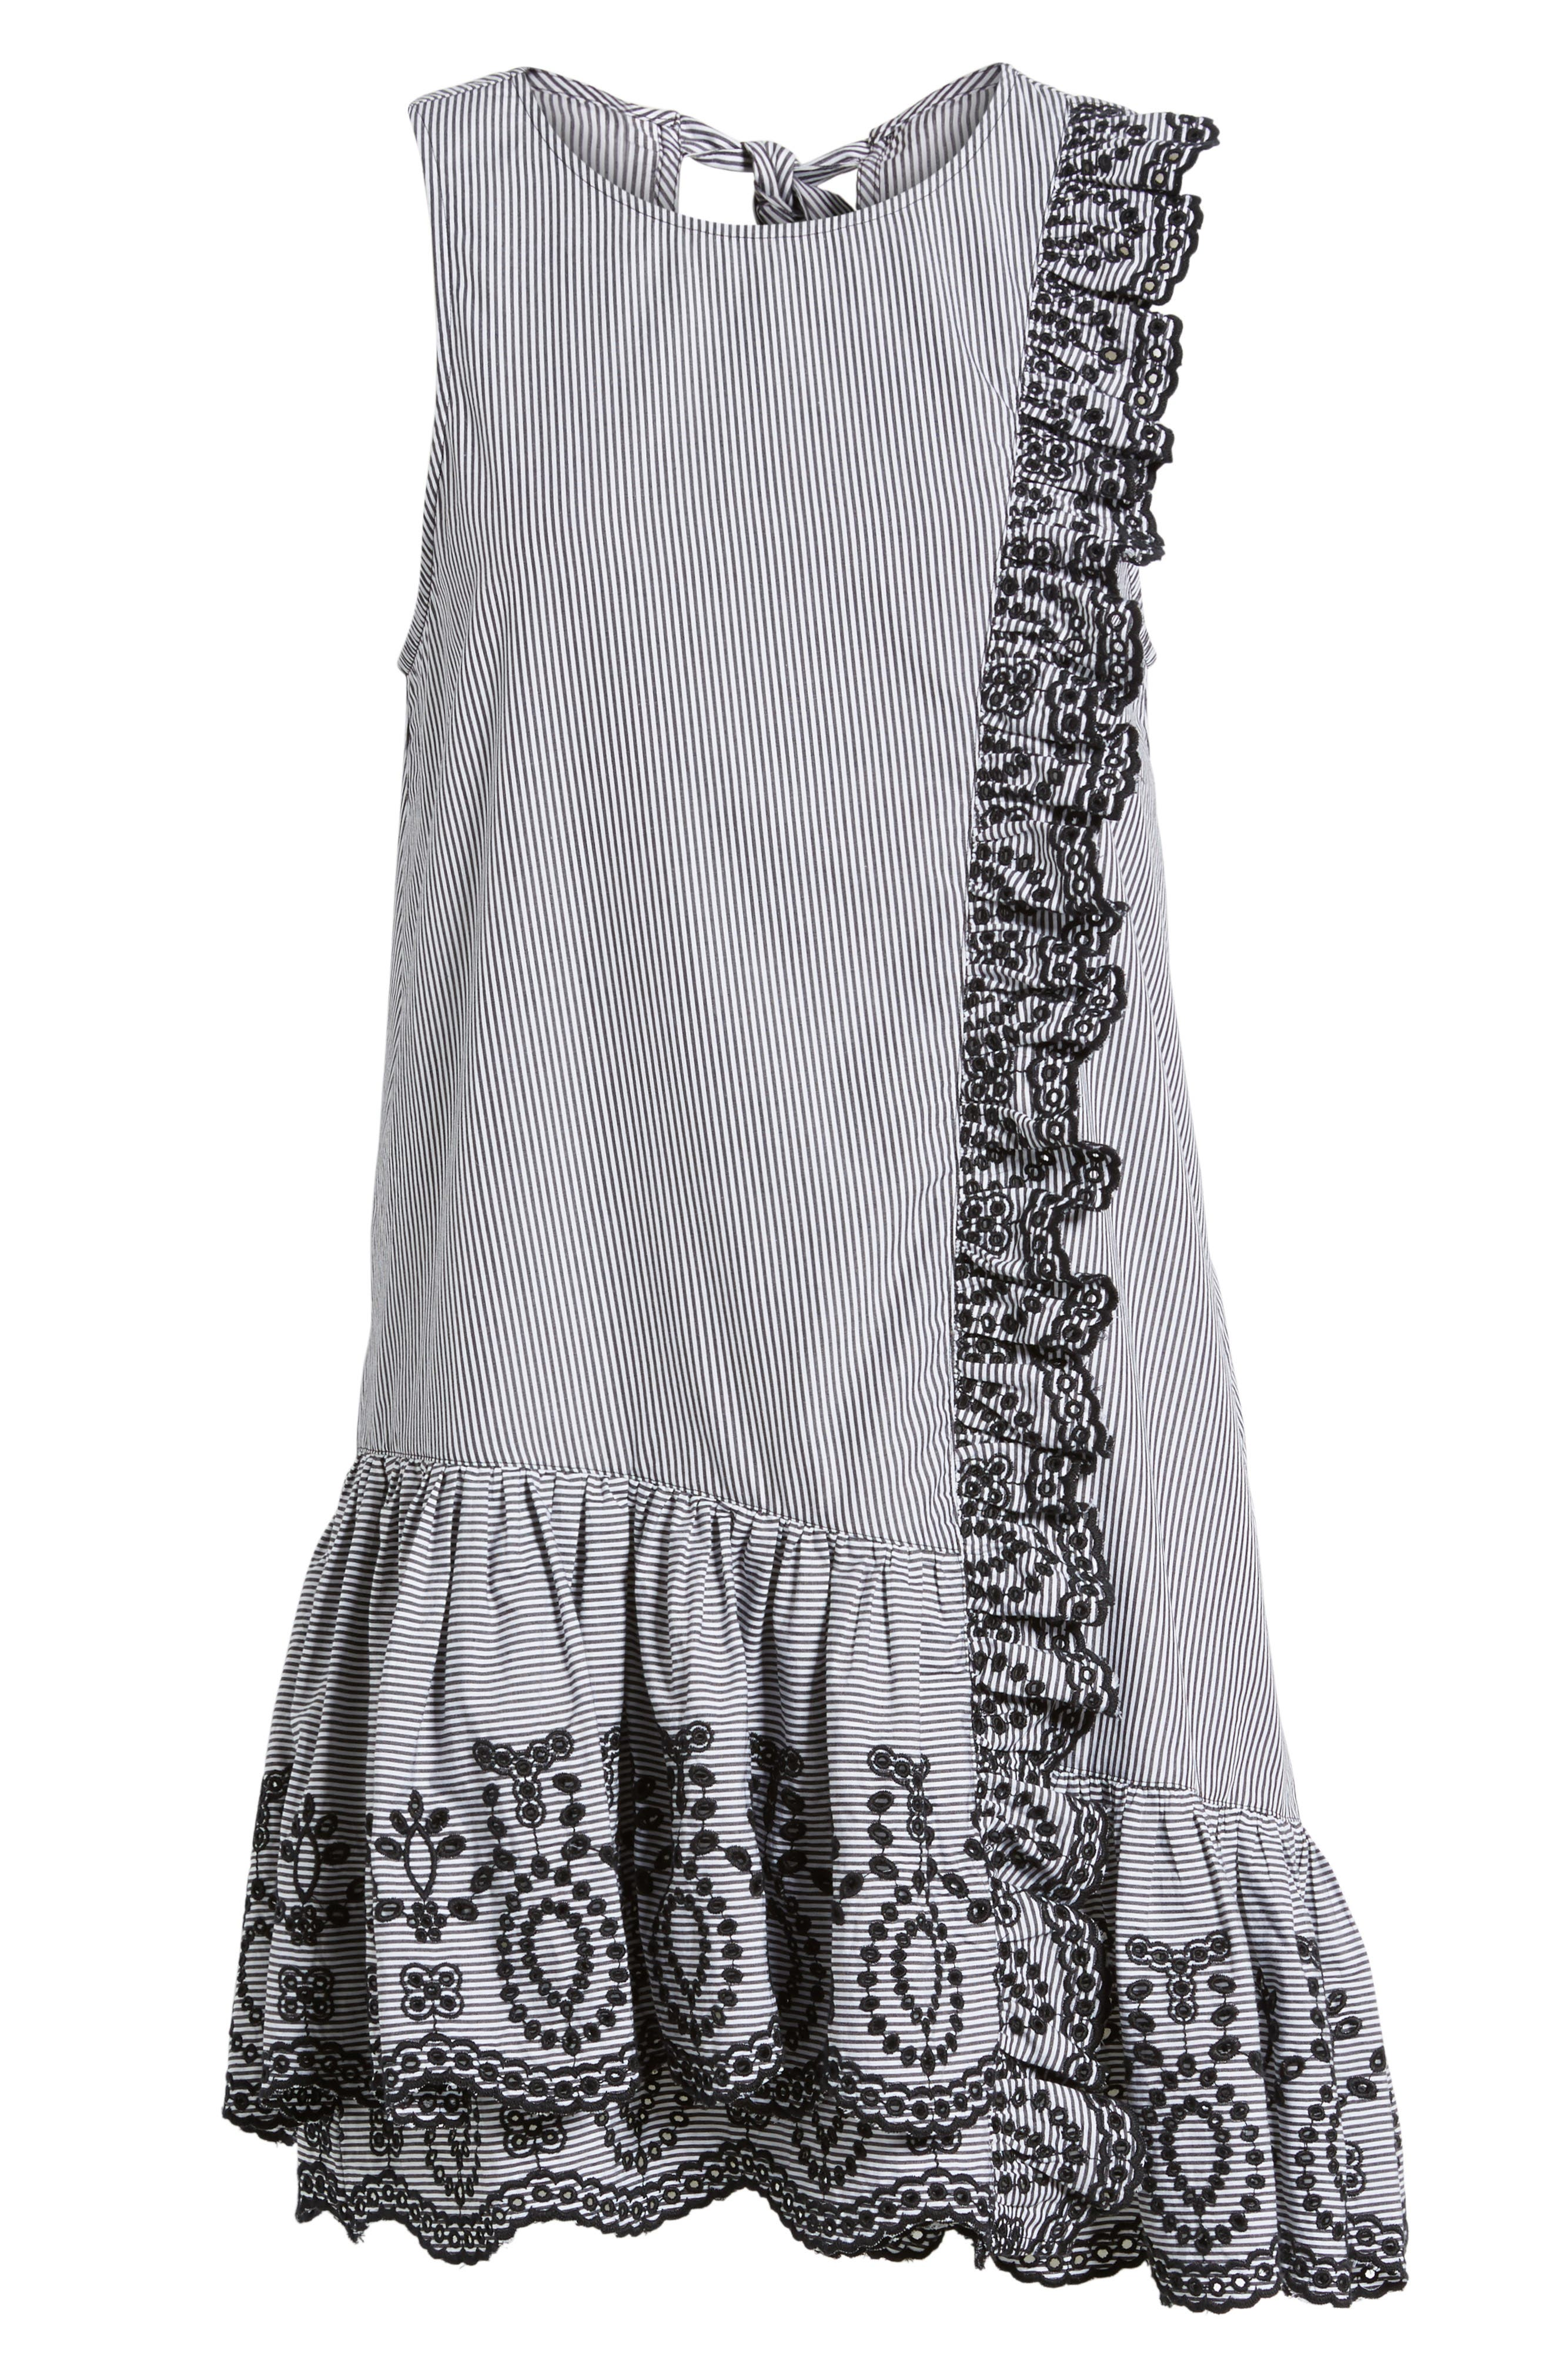 Lace Trim Drop Waist Dress,                             Alternate thumbnail 6, color,                             Black Jenny Stripe